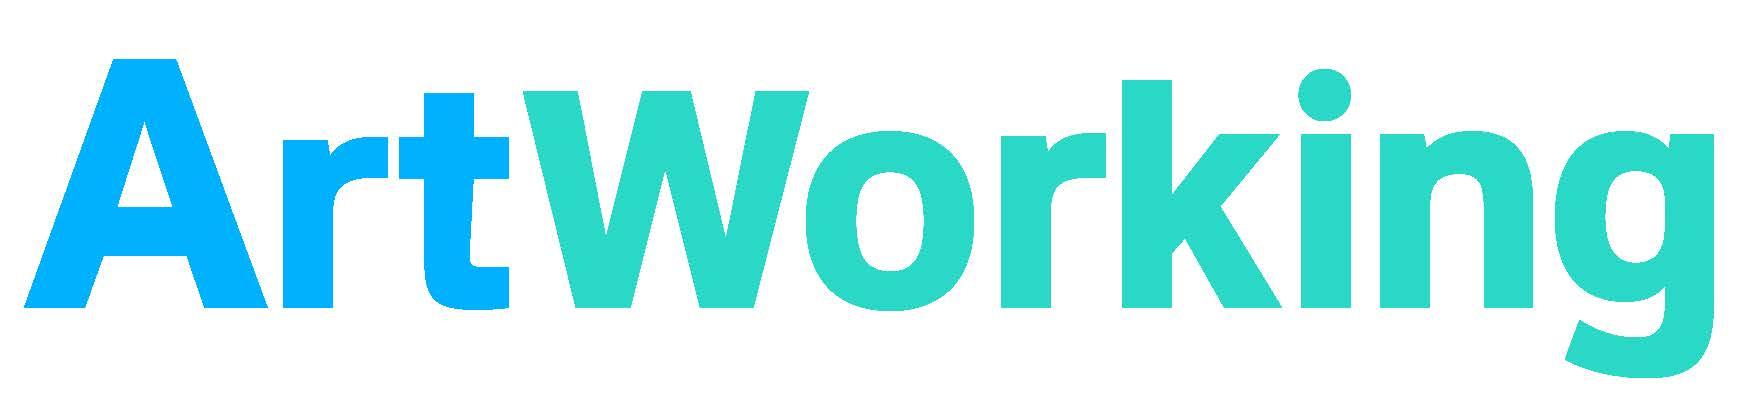 ArtWorking blue green logo banner format copy